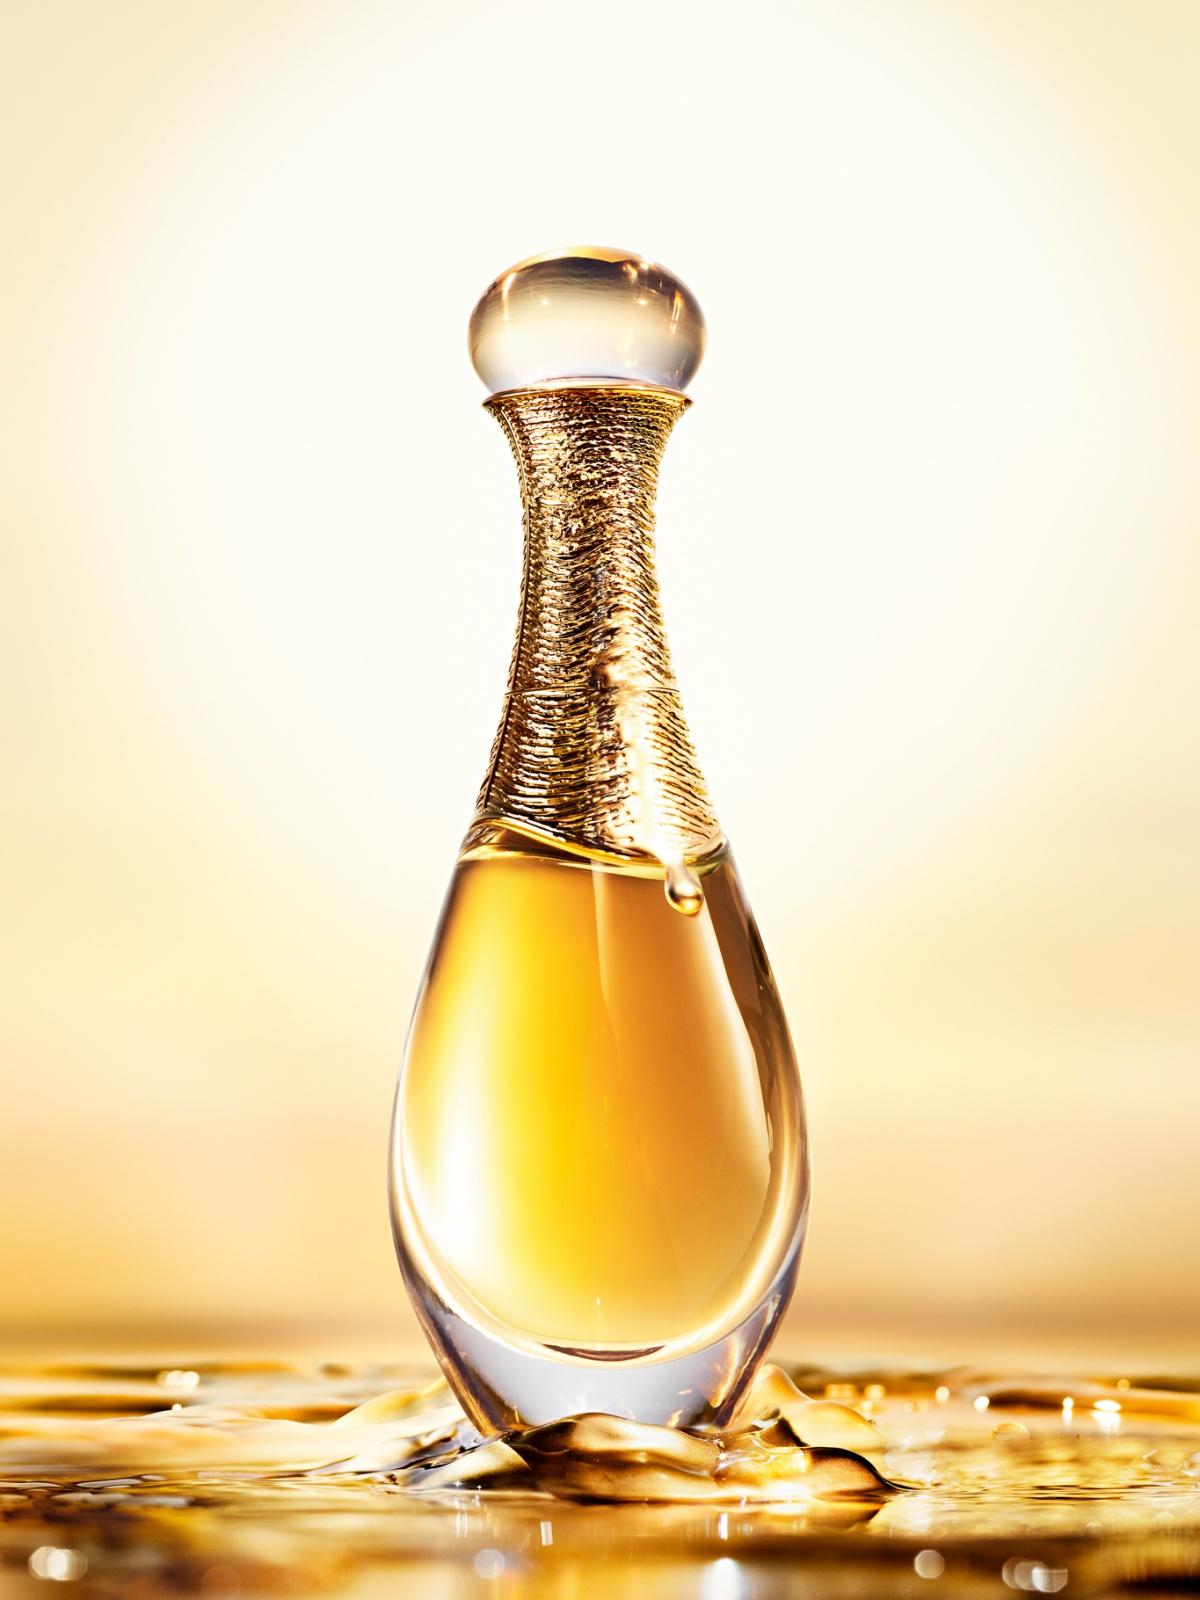 dior j 39 adore l 39 or essence de parfum 2017 new fragrances. Black Bedroom Furniture Sets. Home Design Ideas